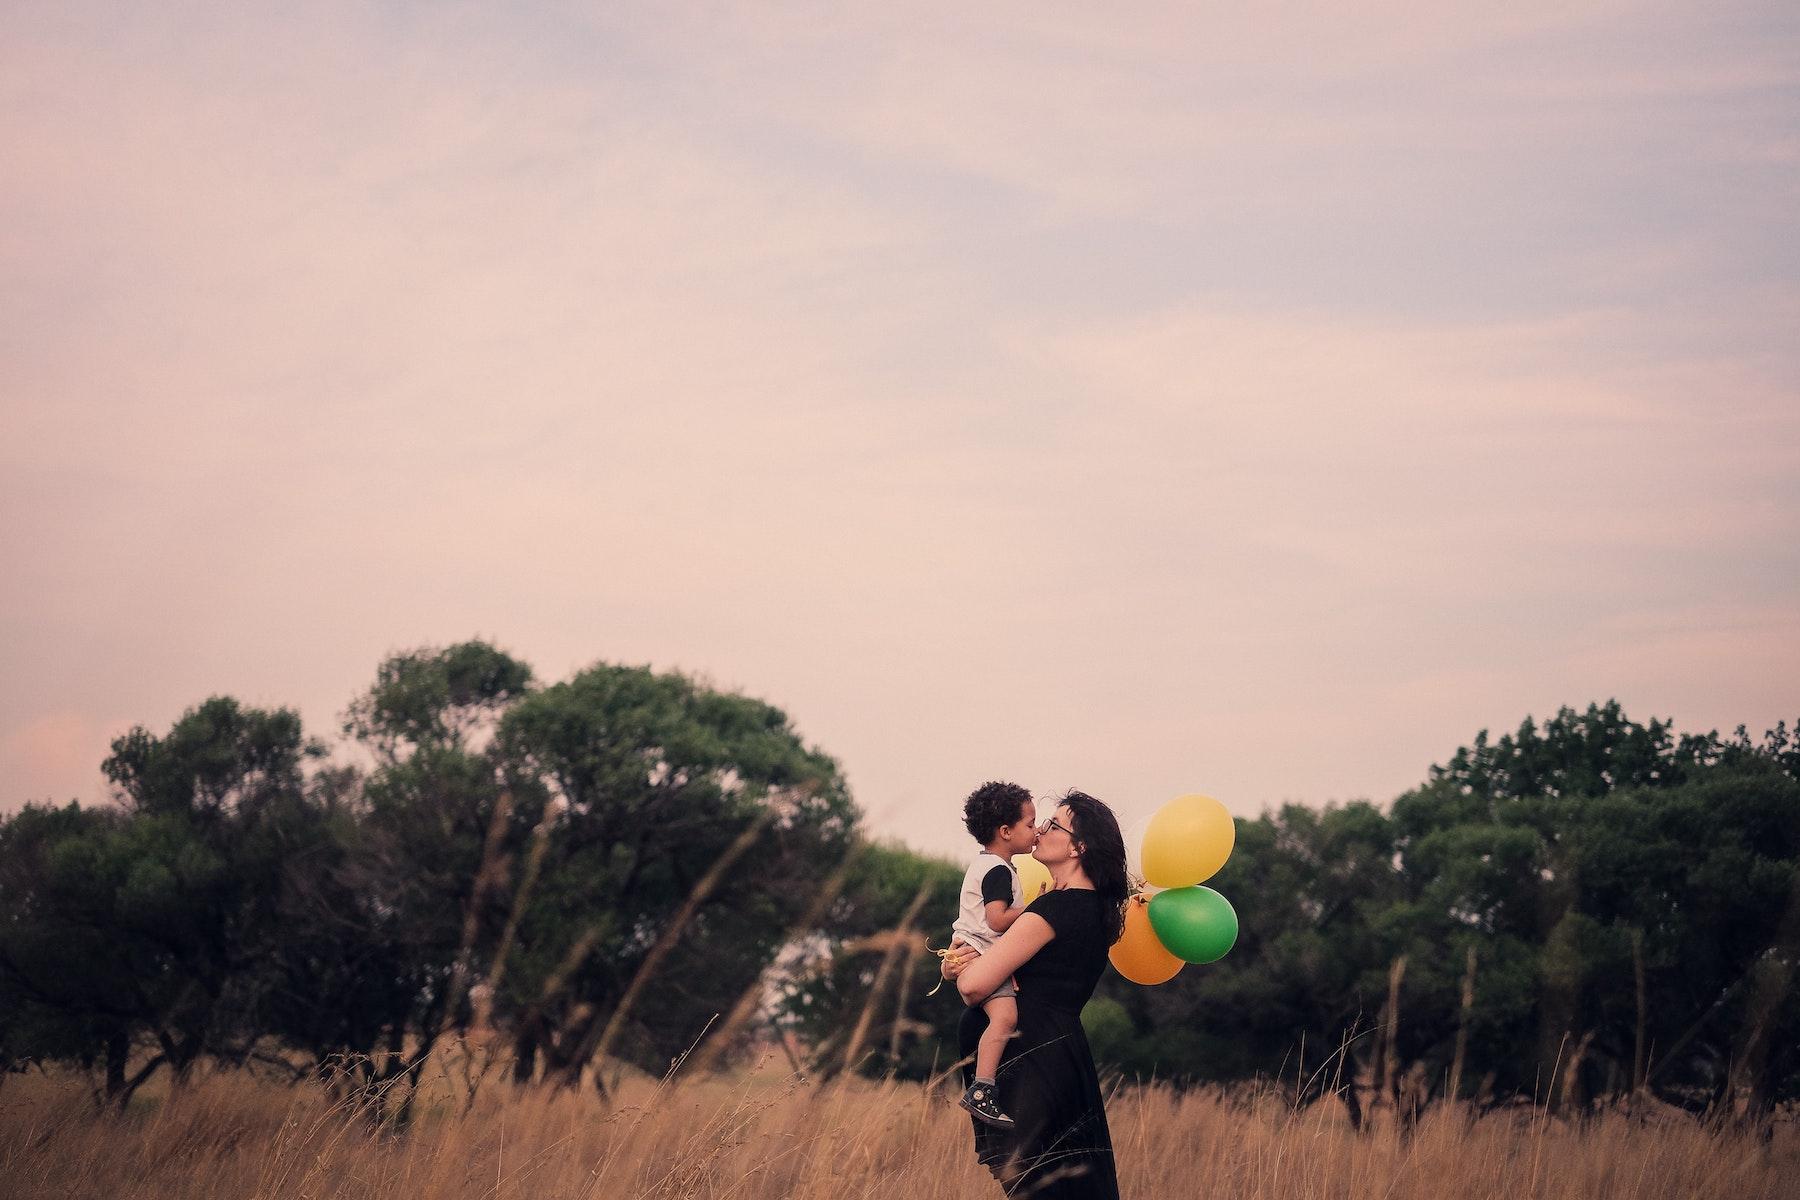 Prove You Love Them | Parent Cue Blog